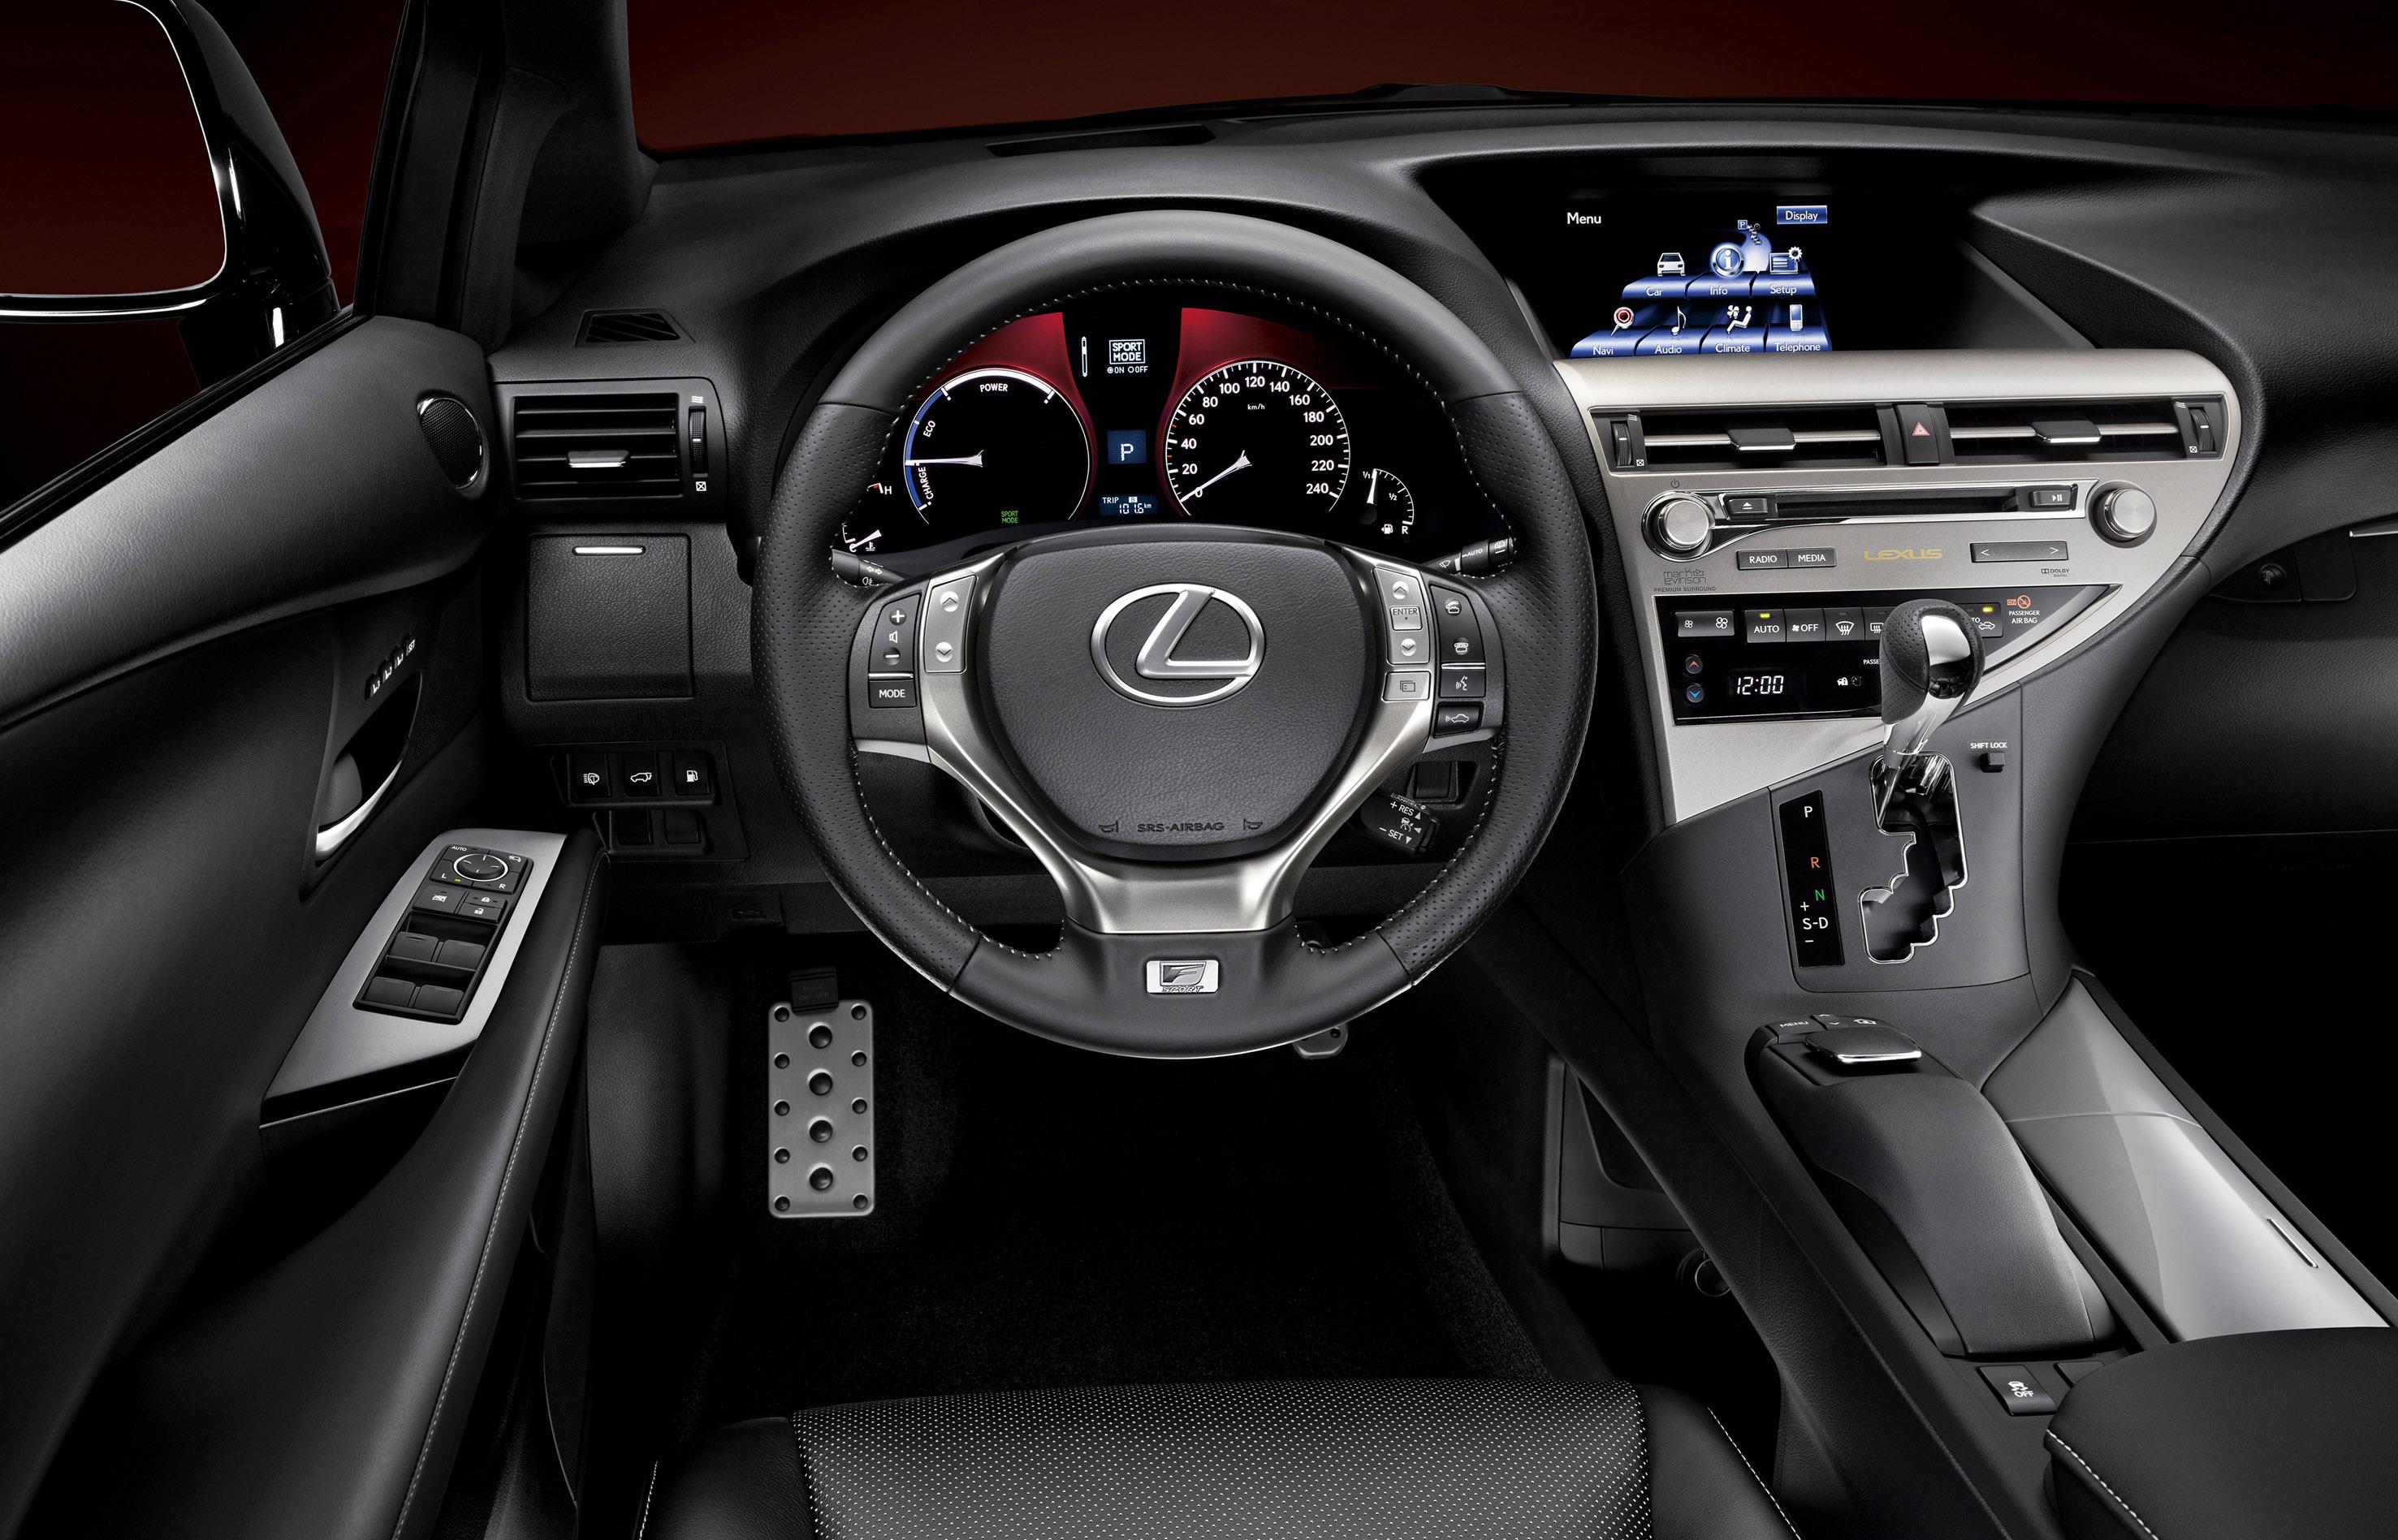 2014 Lexus RX 450h Hybrid Quick Spin